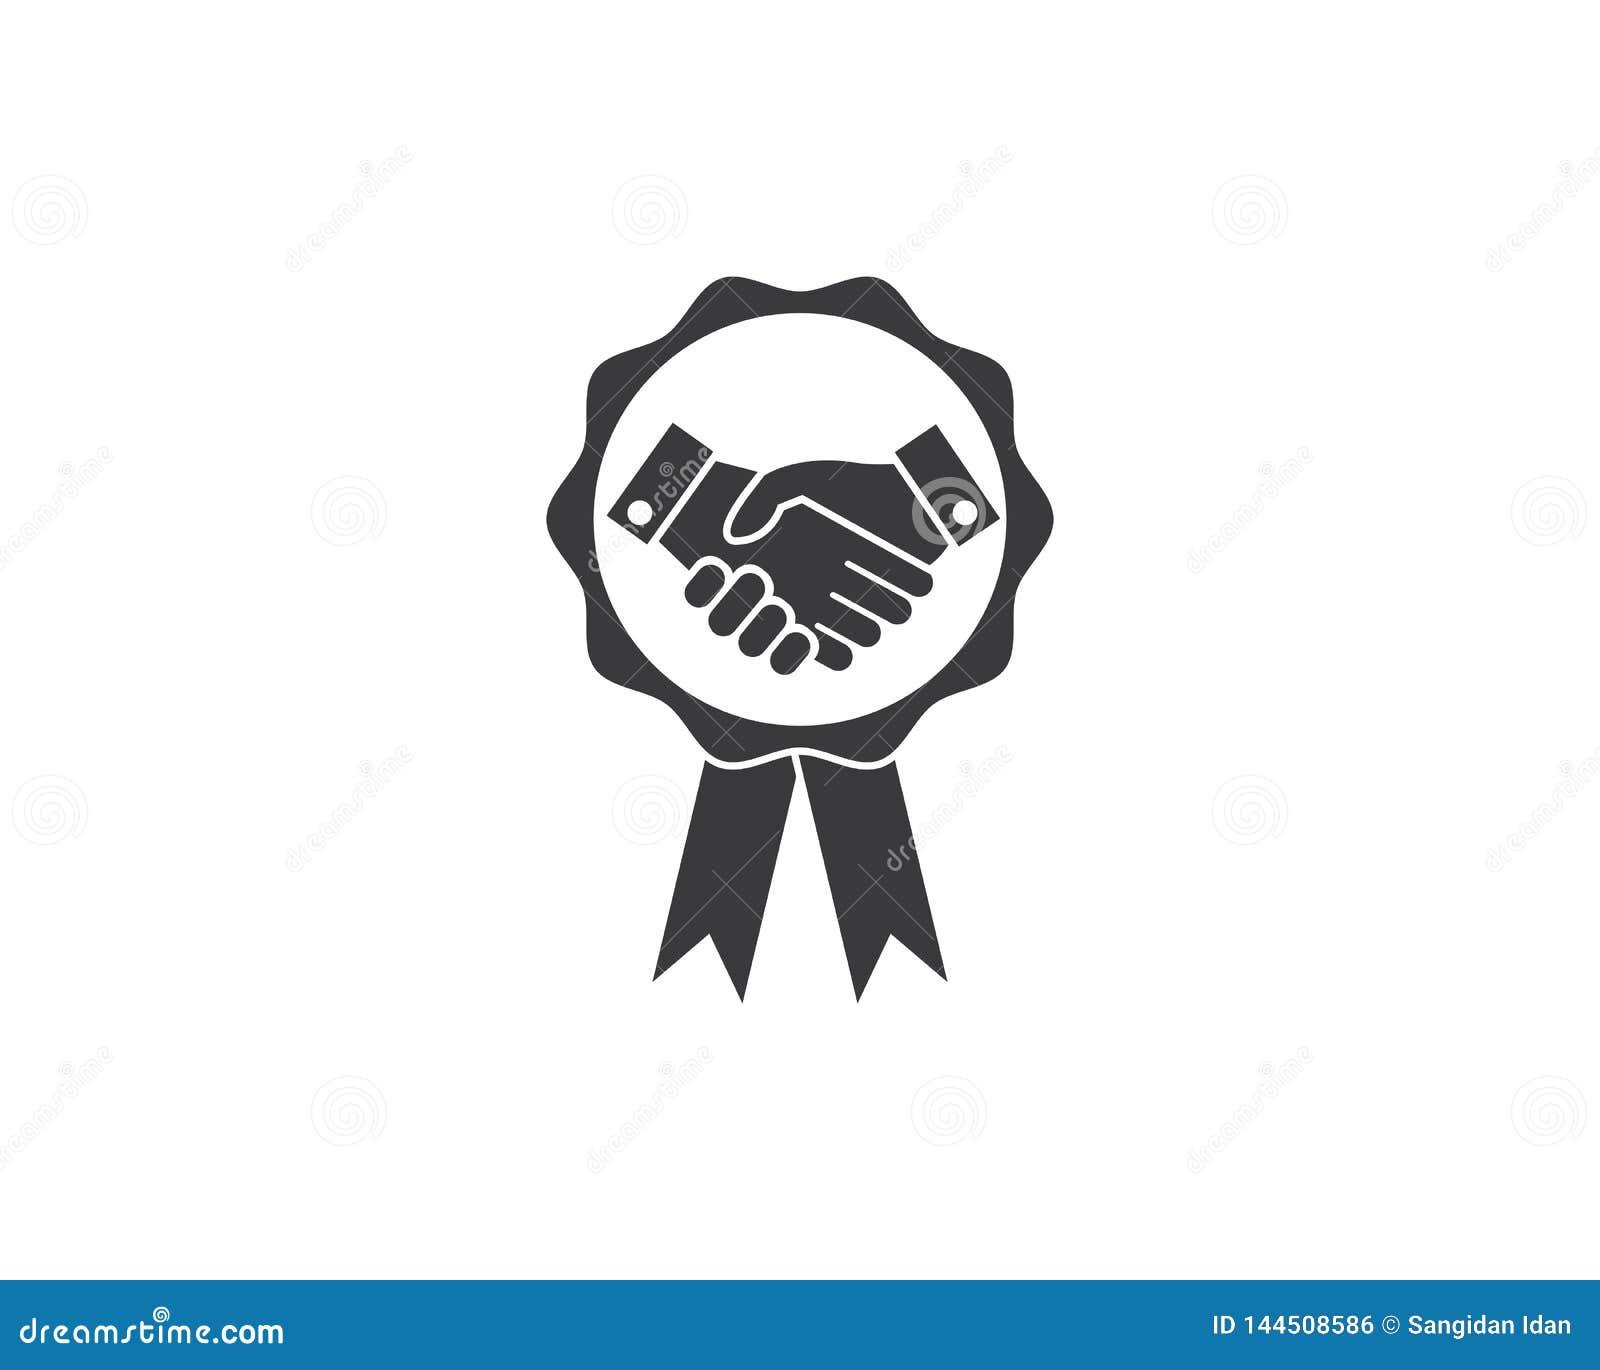 handshake logo vector icon of business agreement